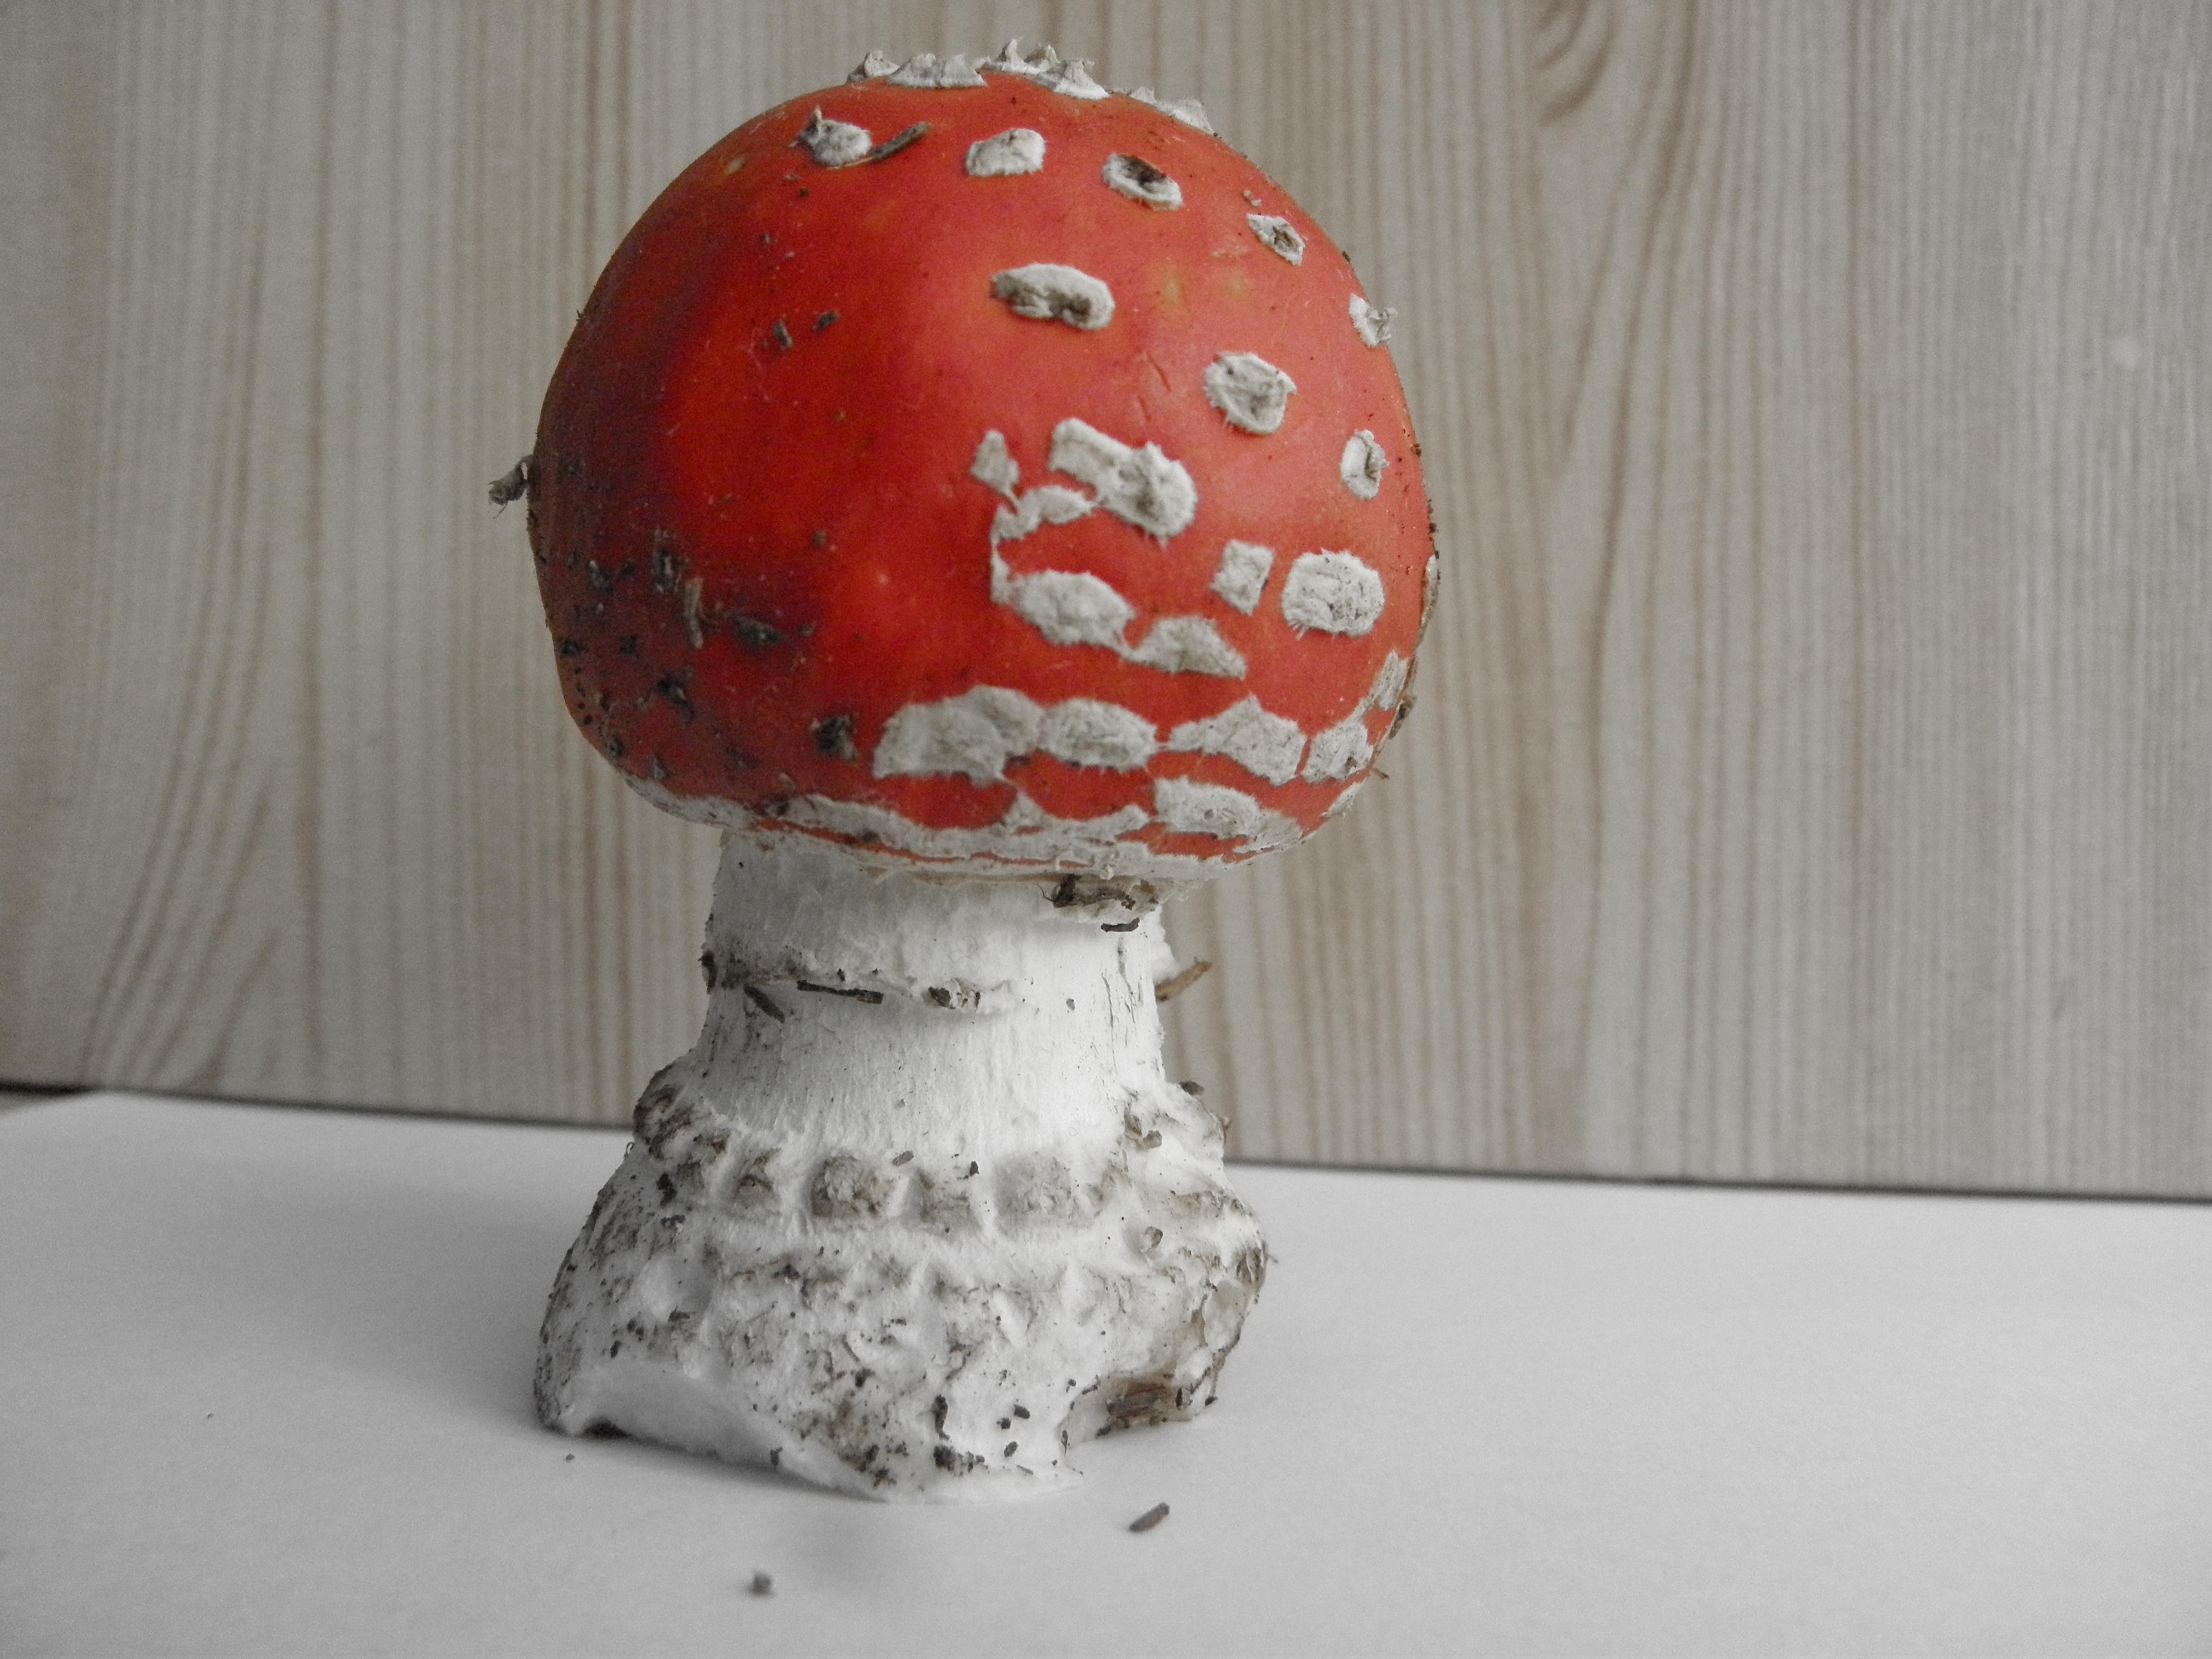 Výsledná houba